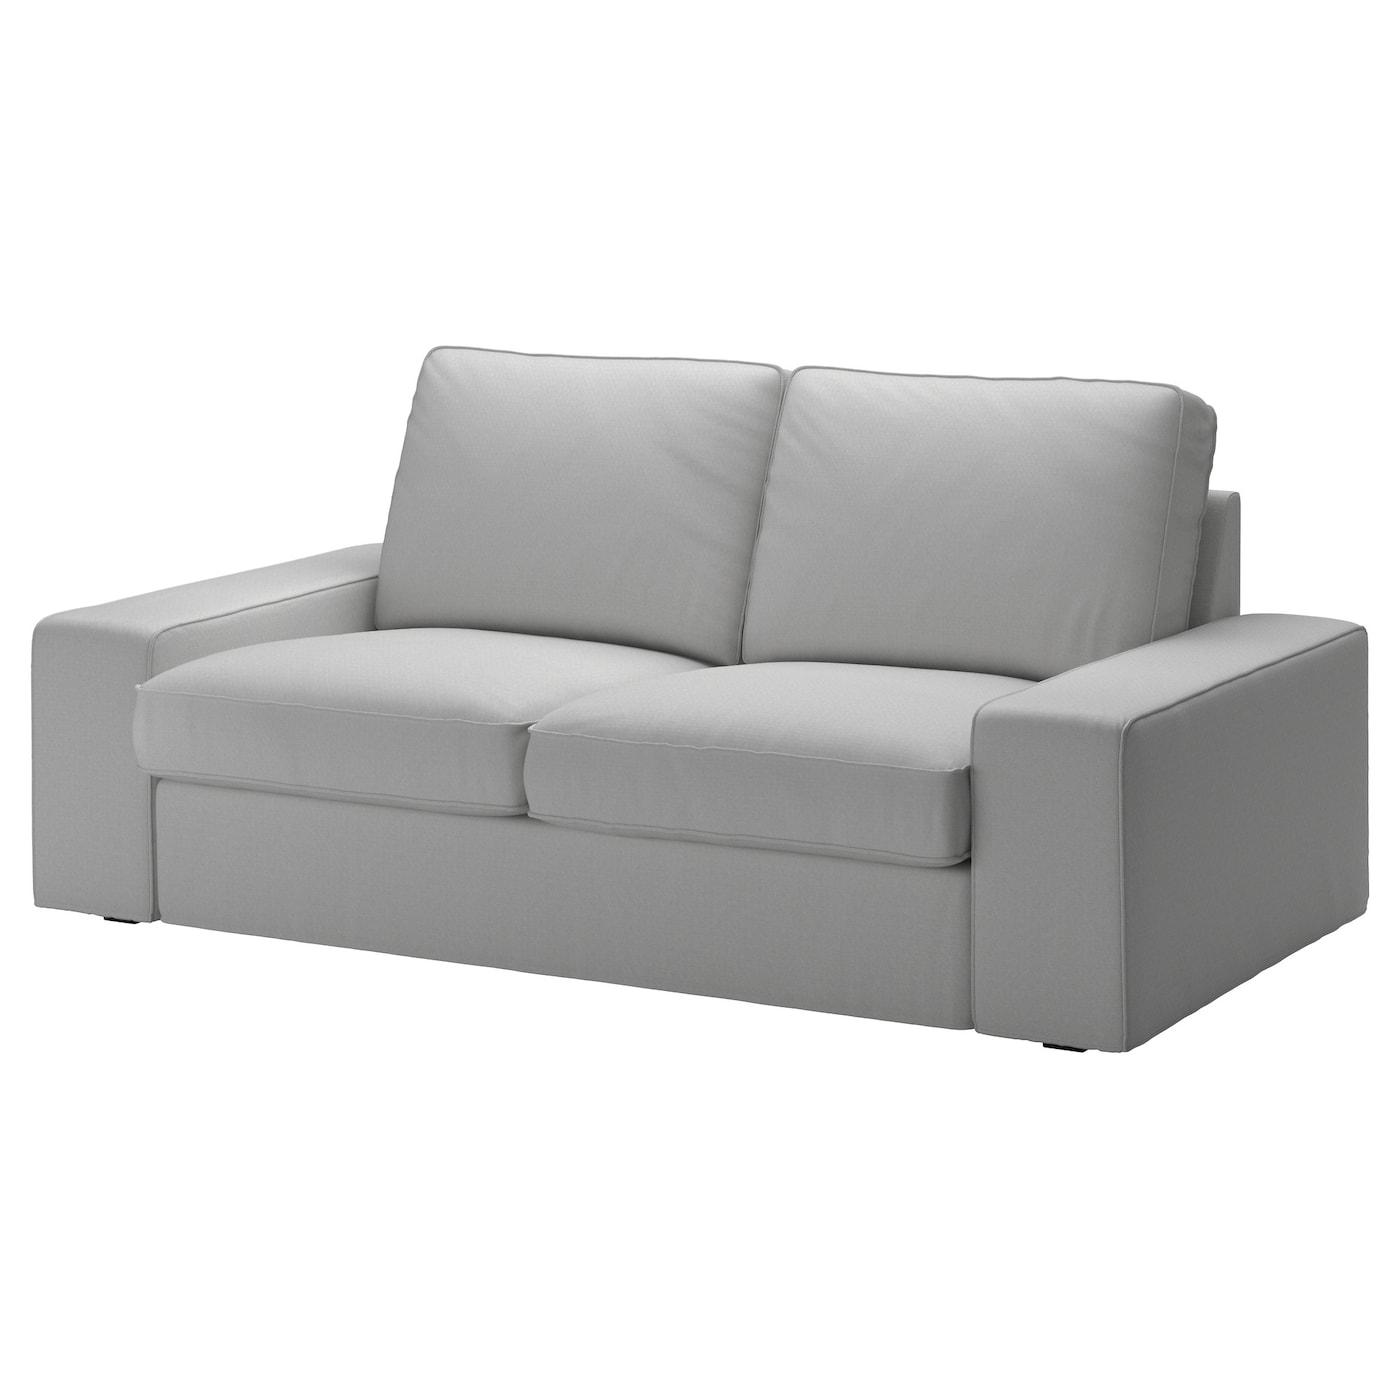 Canapés En Tissu IKEA - Banquette crapaud 2 places